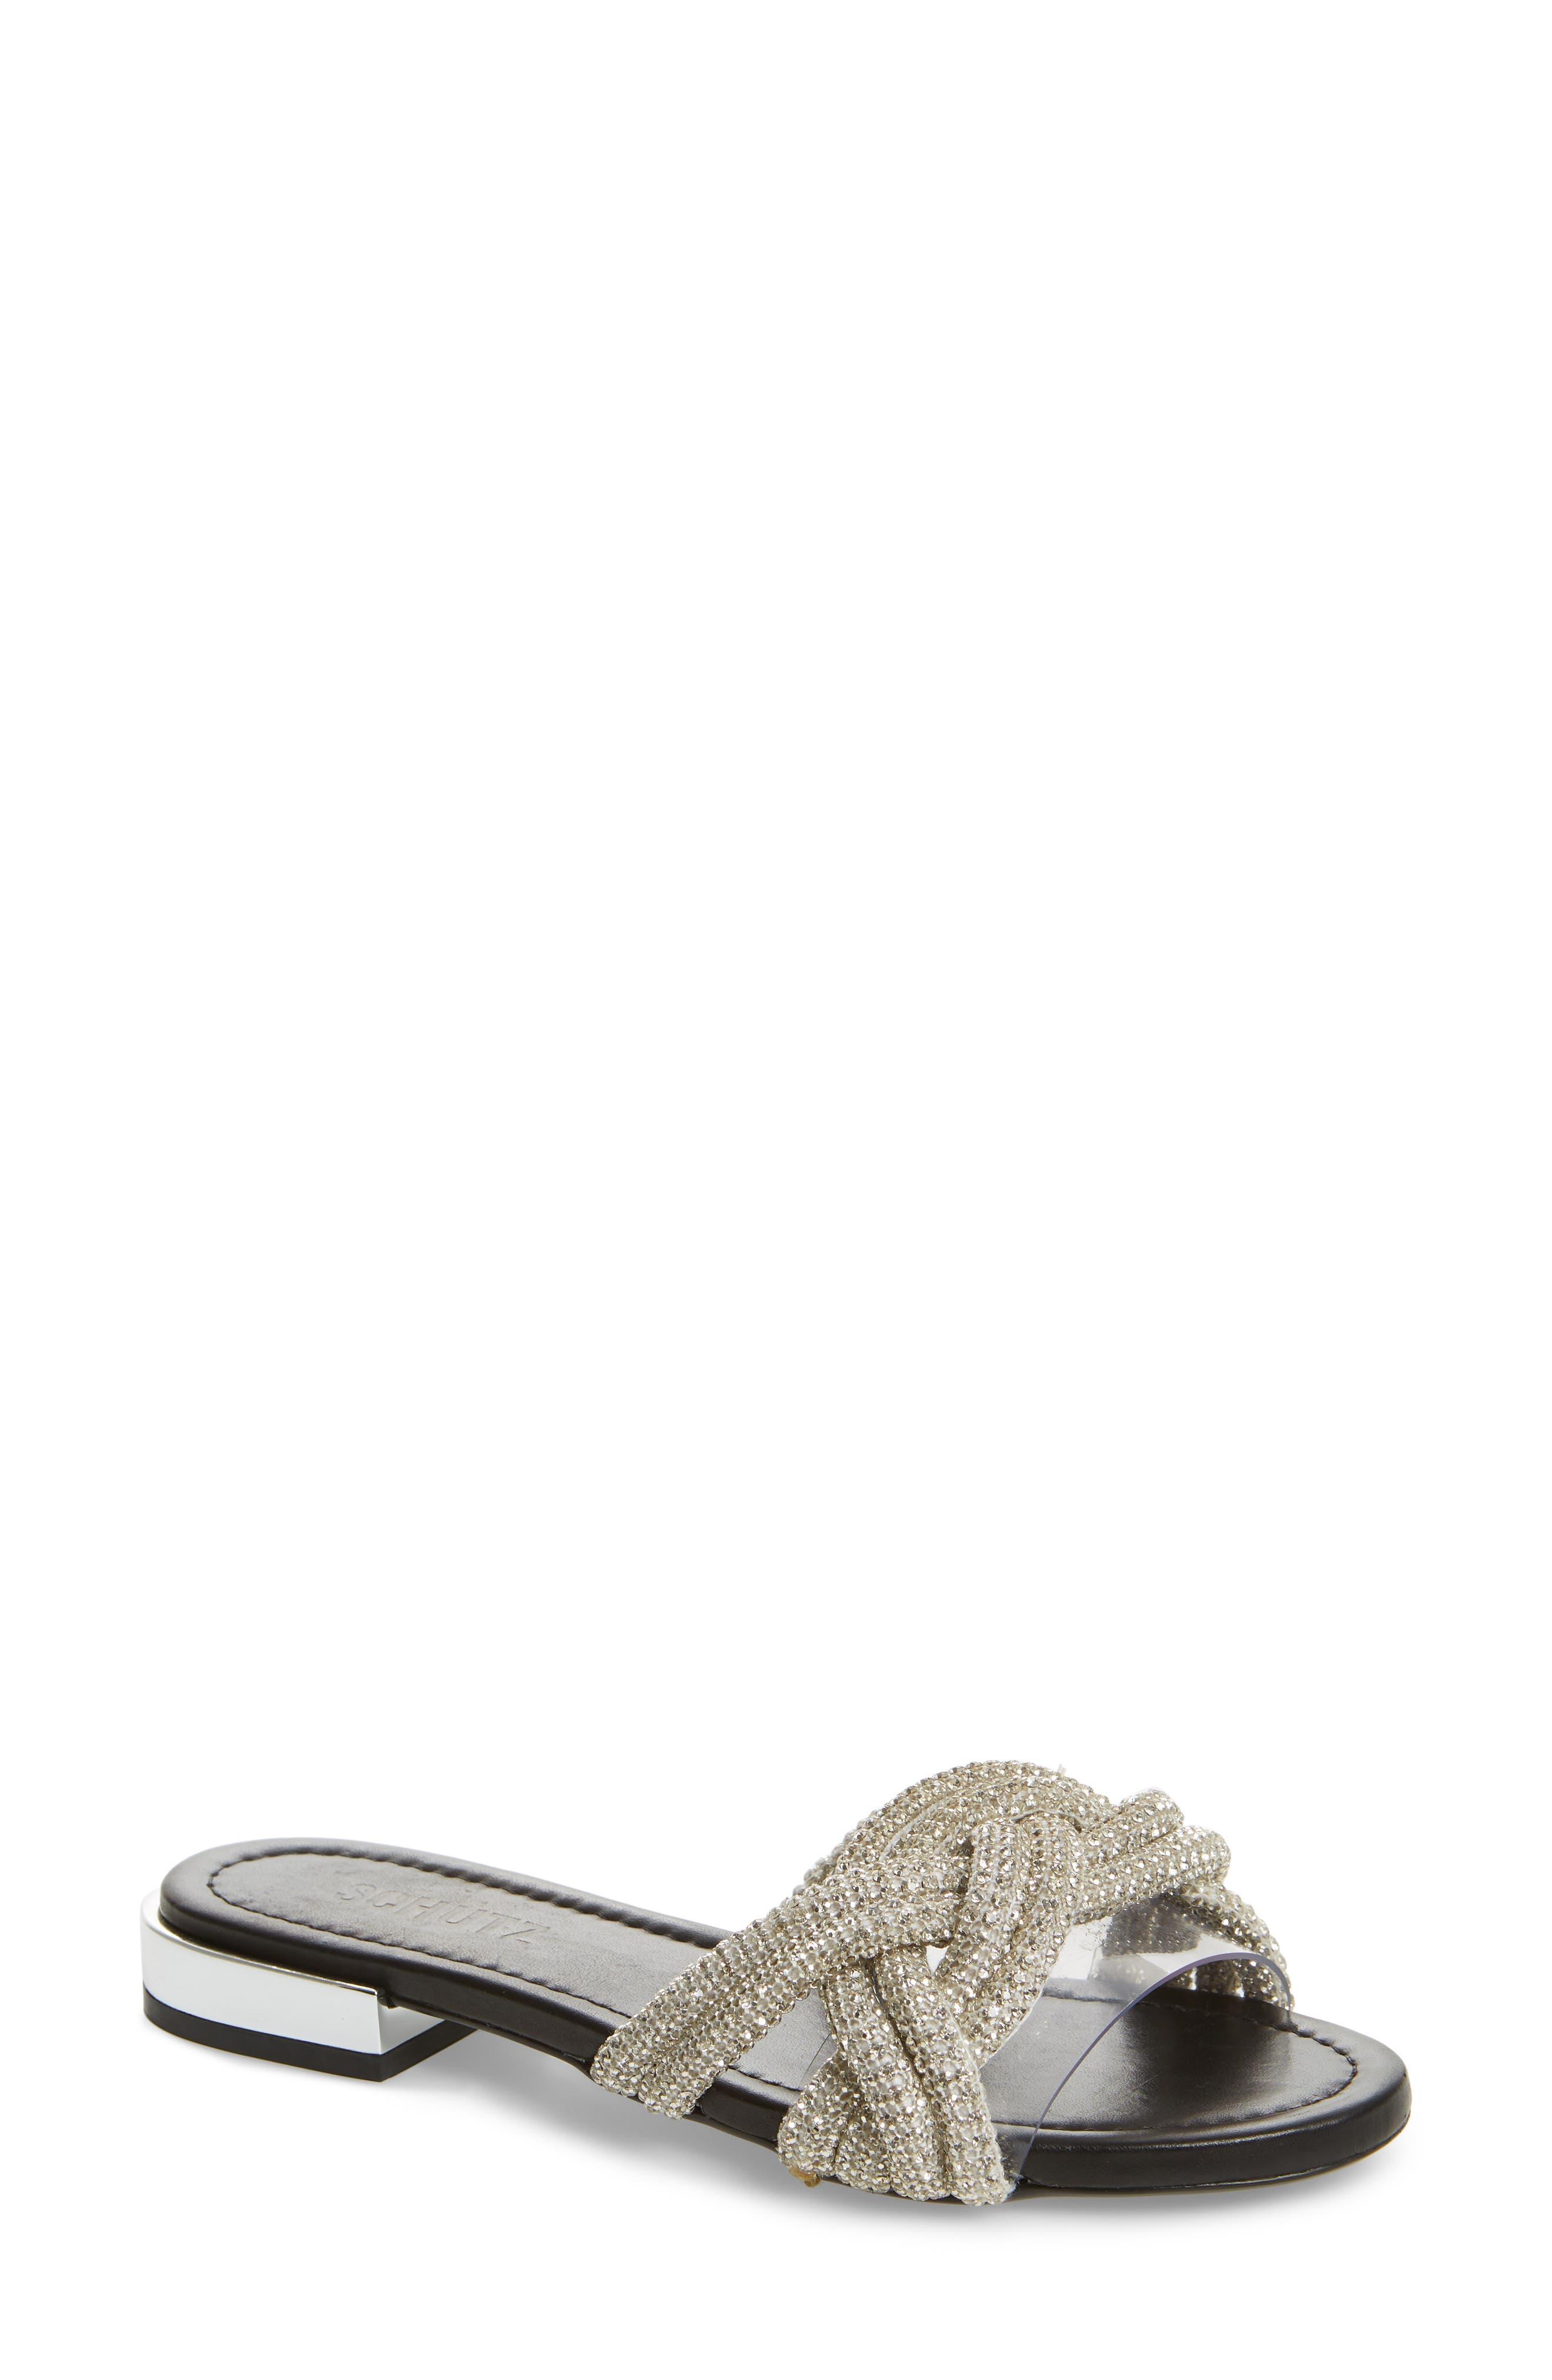 Schutz Lindy Braided Slide Sandal, White